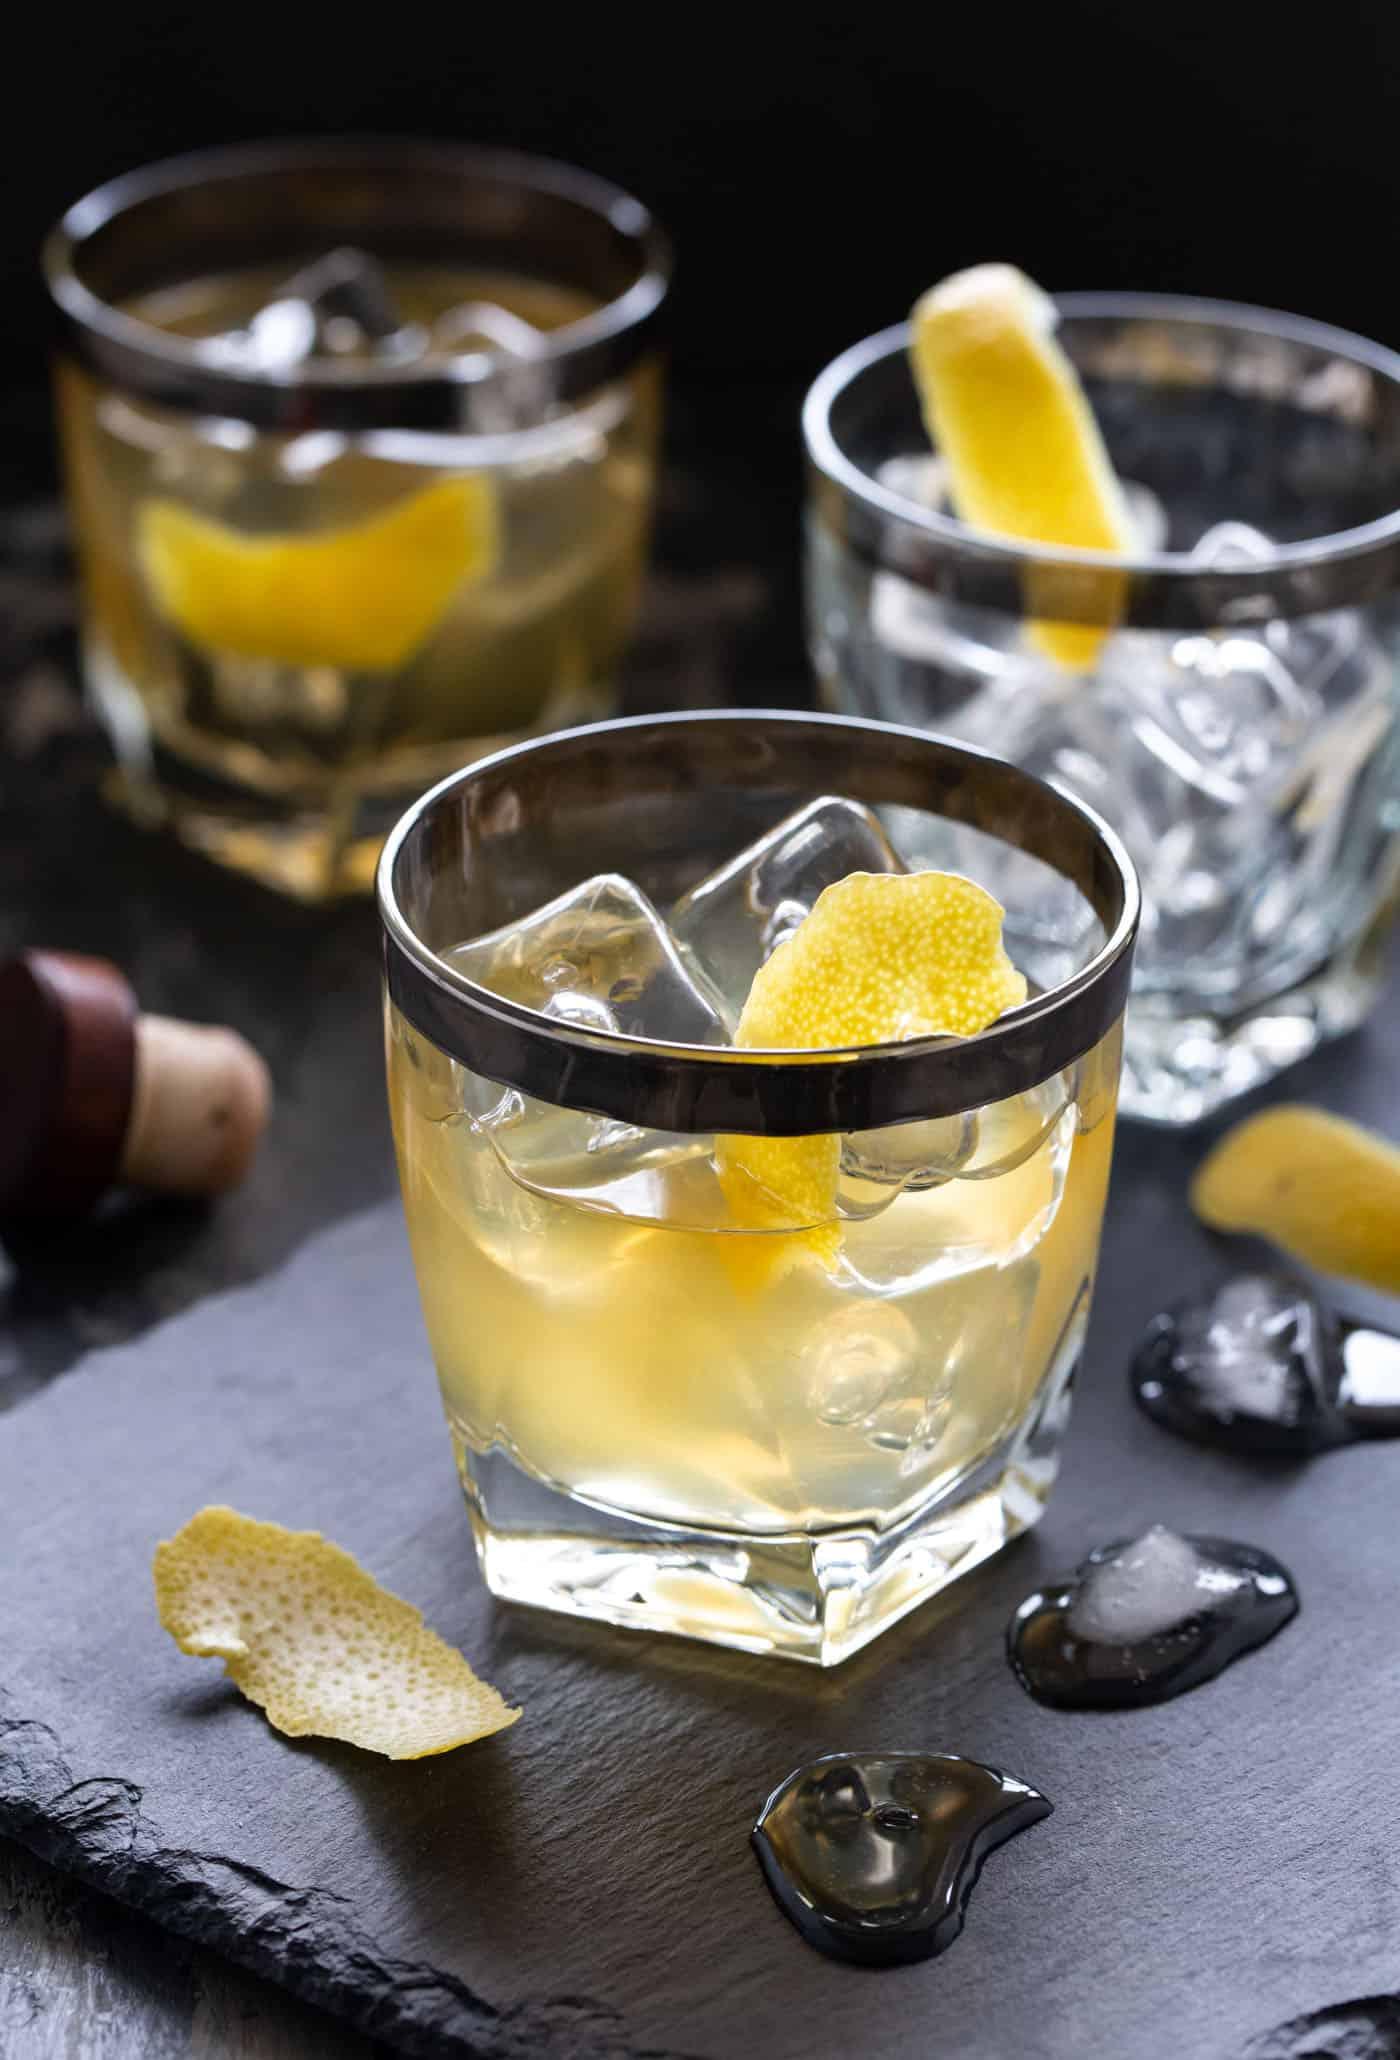 3 low ball glasses filled with Bourbon Elderflower Cocktails on a dark slate board. Garnished with lemon peels.